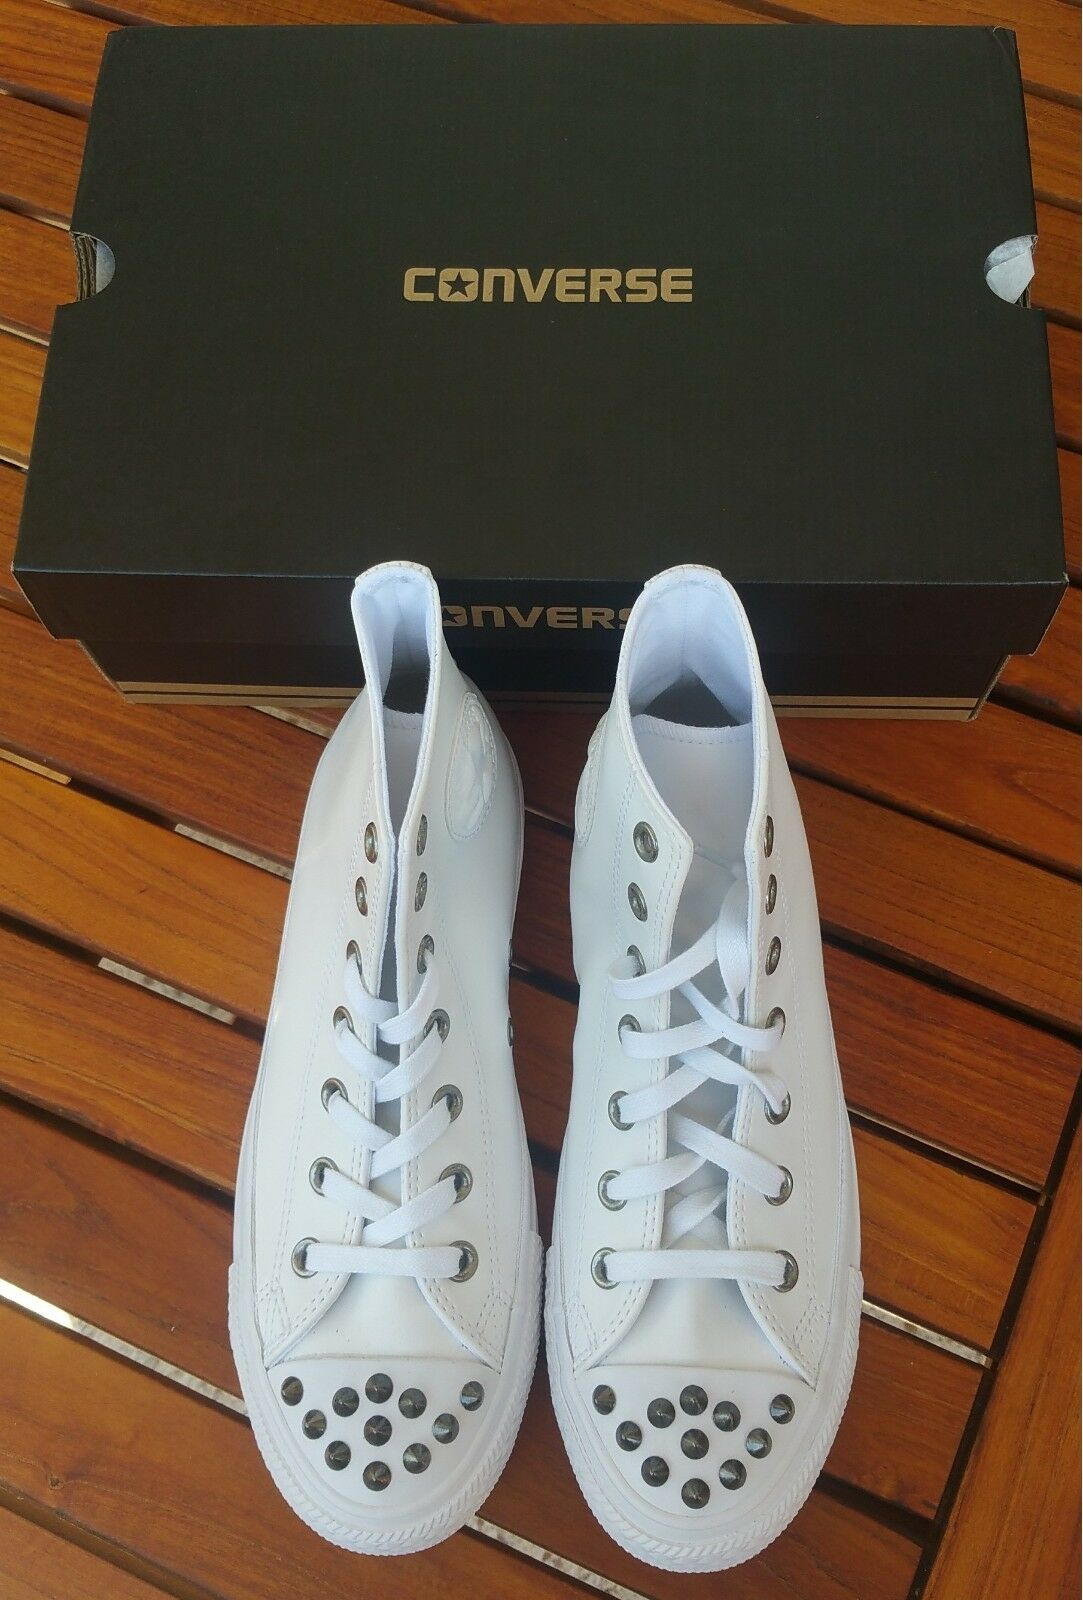 Converse Chuck Taylor All Star Studs scarpe da ginnastica High TG 39 Pelle Bianco neu&ovp | Pratico Ed Economico  | Scolaro/Ragazze Scarpa